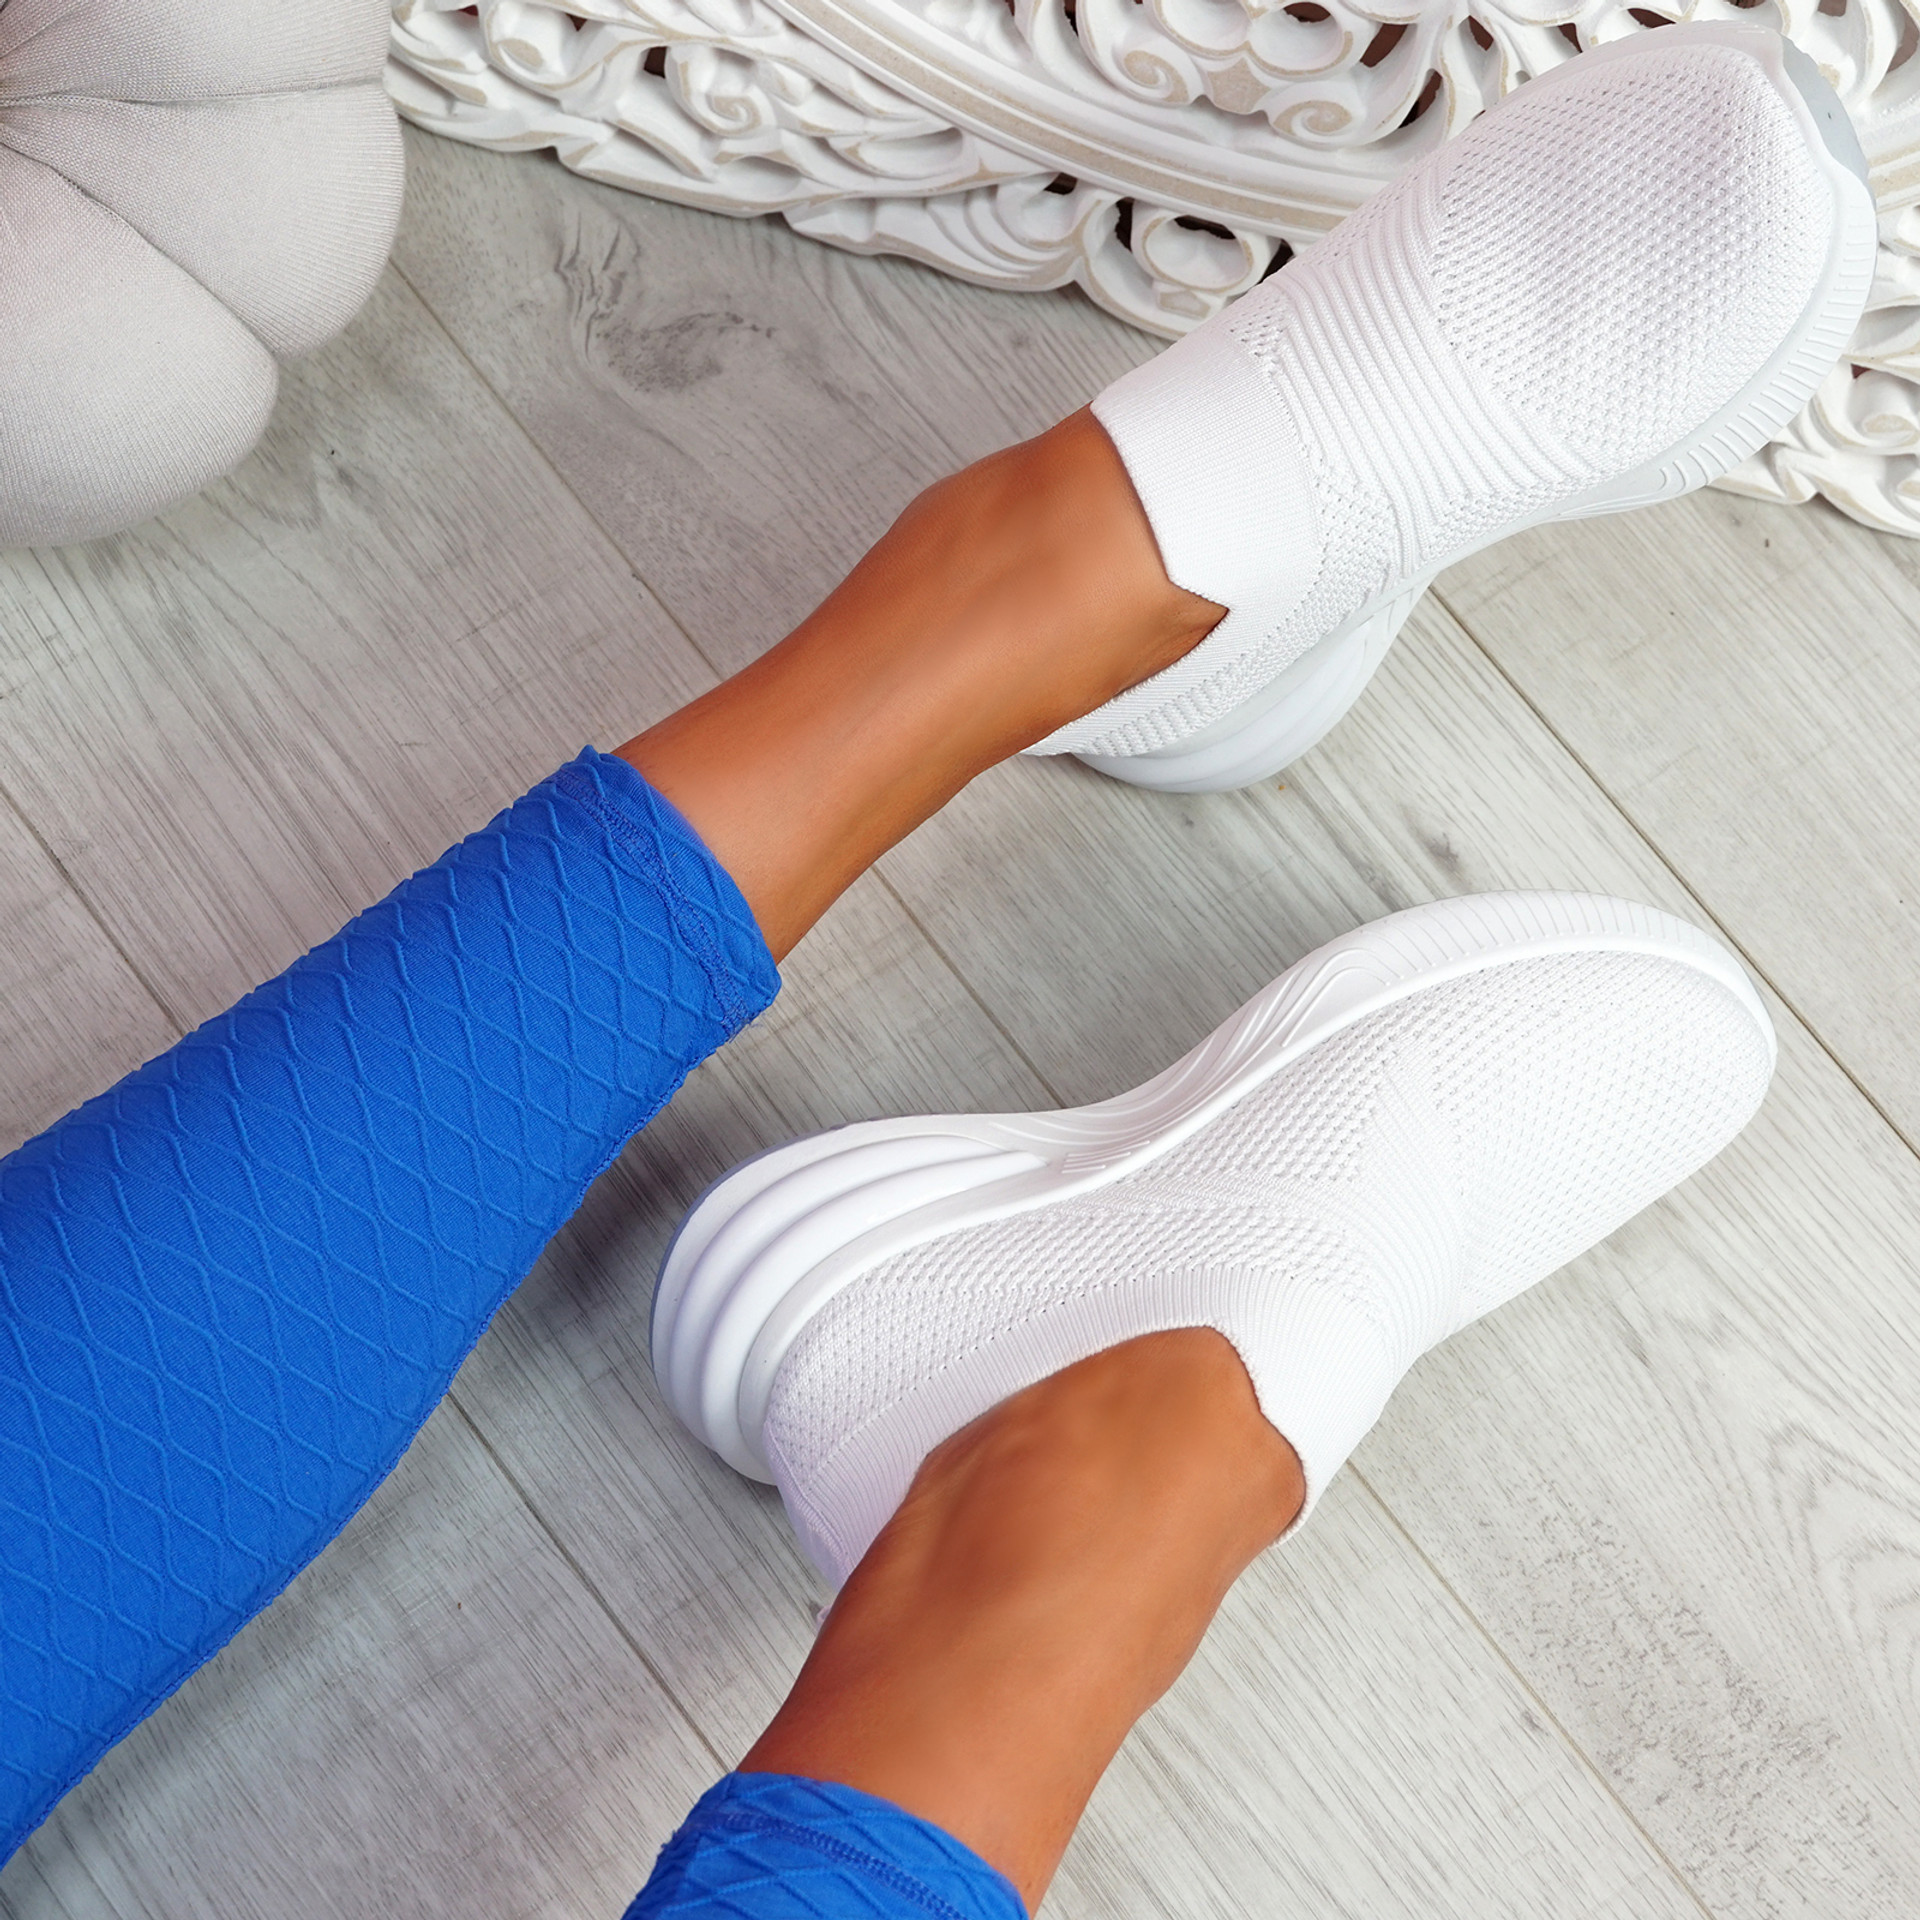 Fibba White Slip On Knit Sneakers